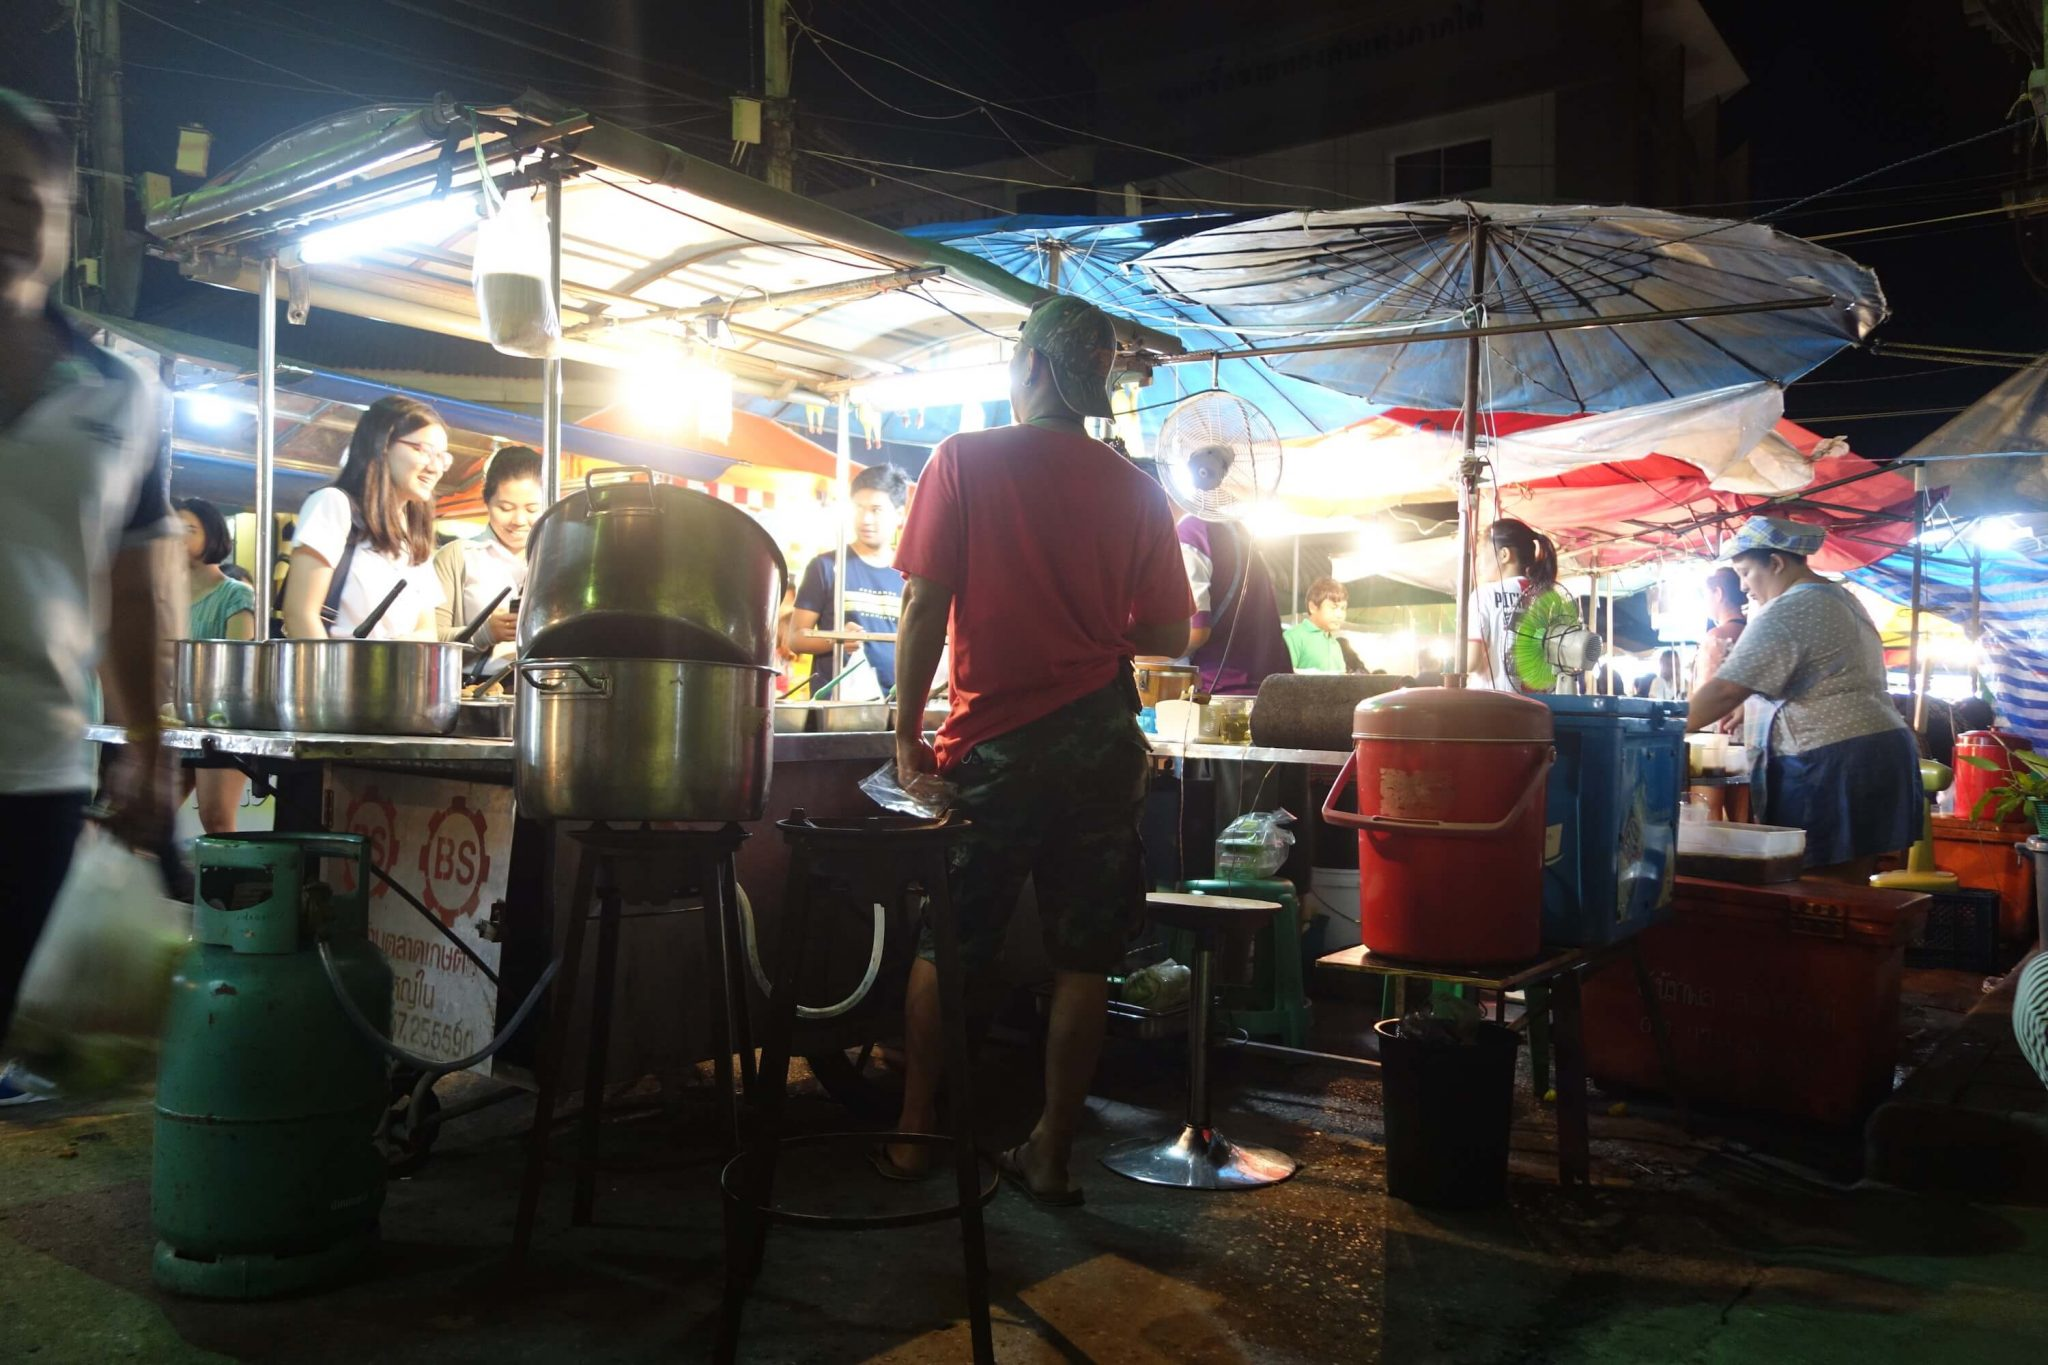 Thailand_SuratThani_Nightmarket_Nachtmarkt_2